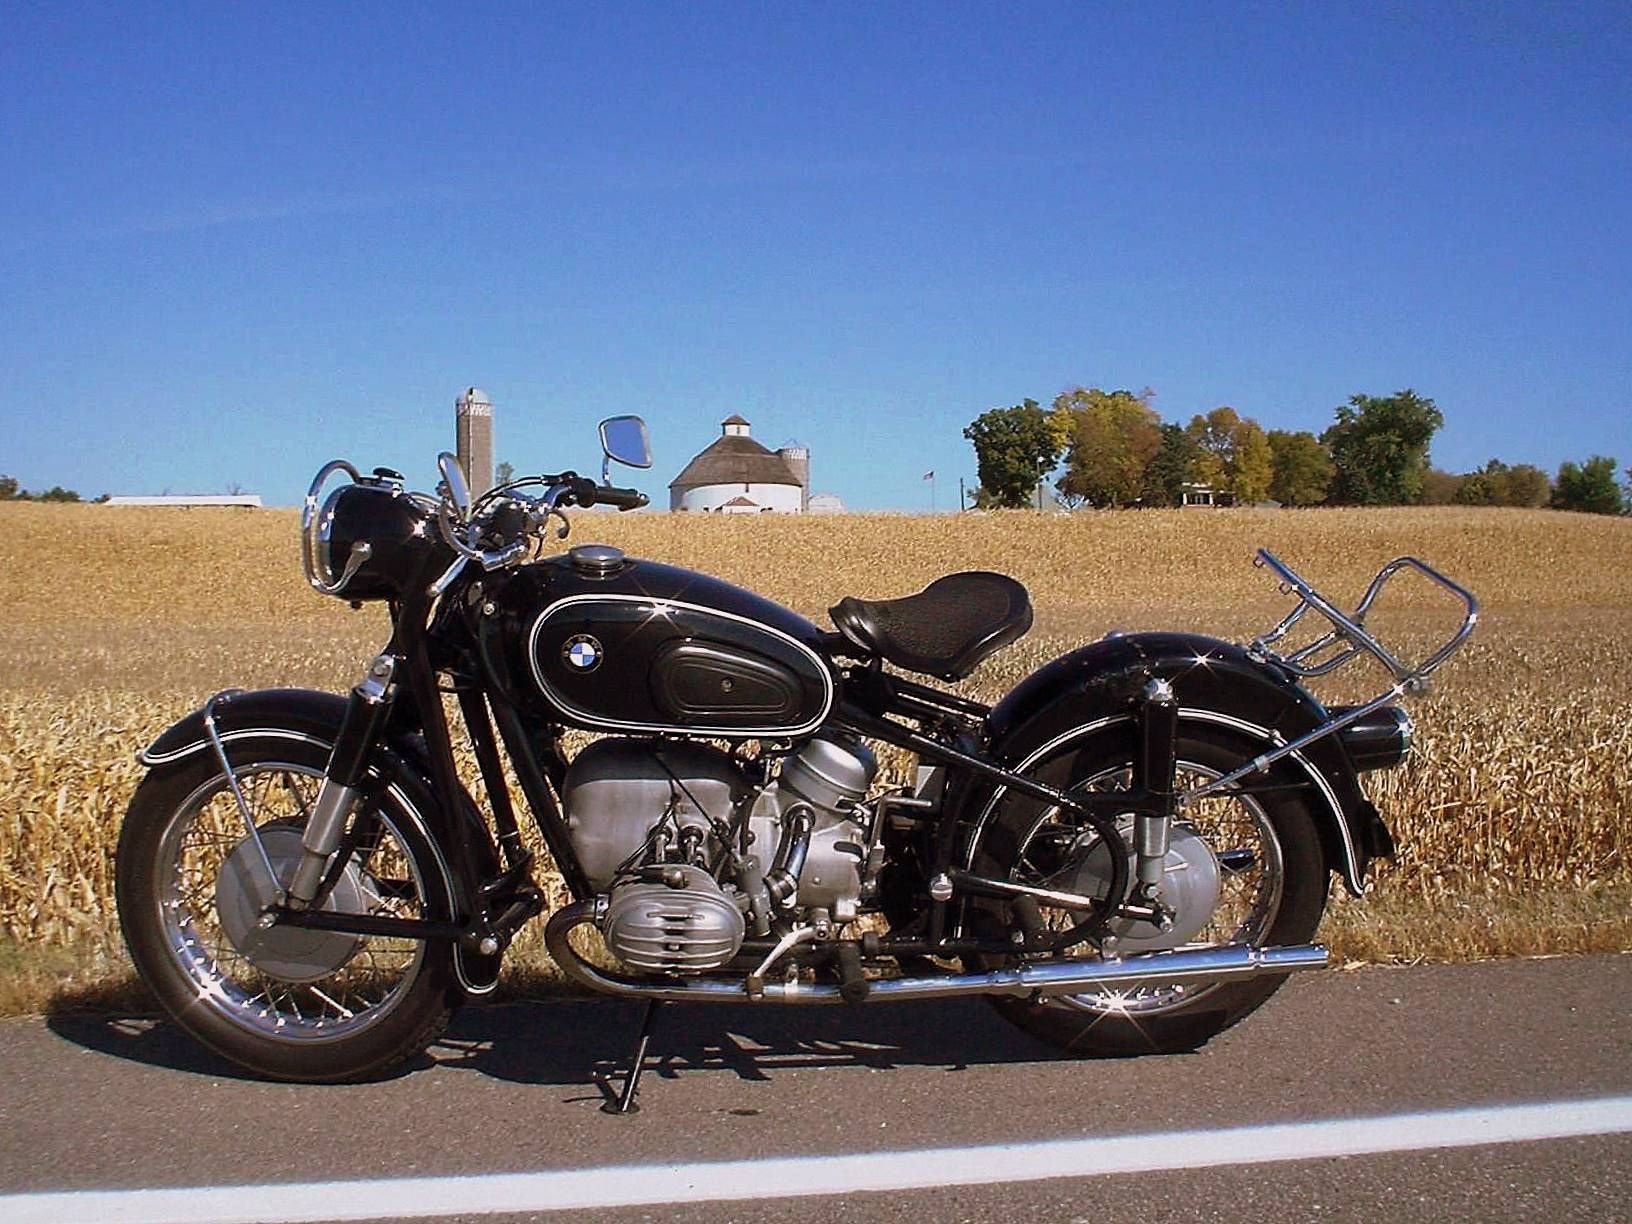 '66 BMW, Round barn, Minnesota Bikes, Cars Motorbikes